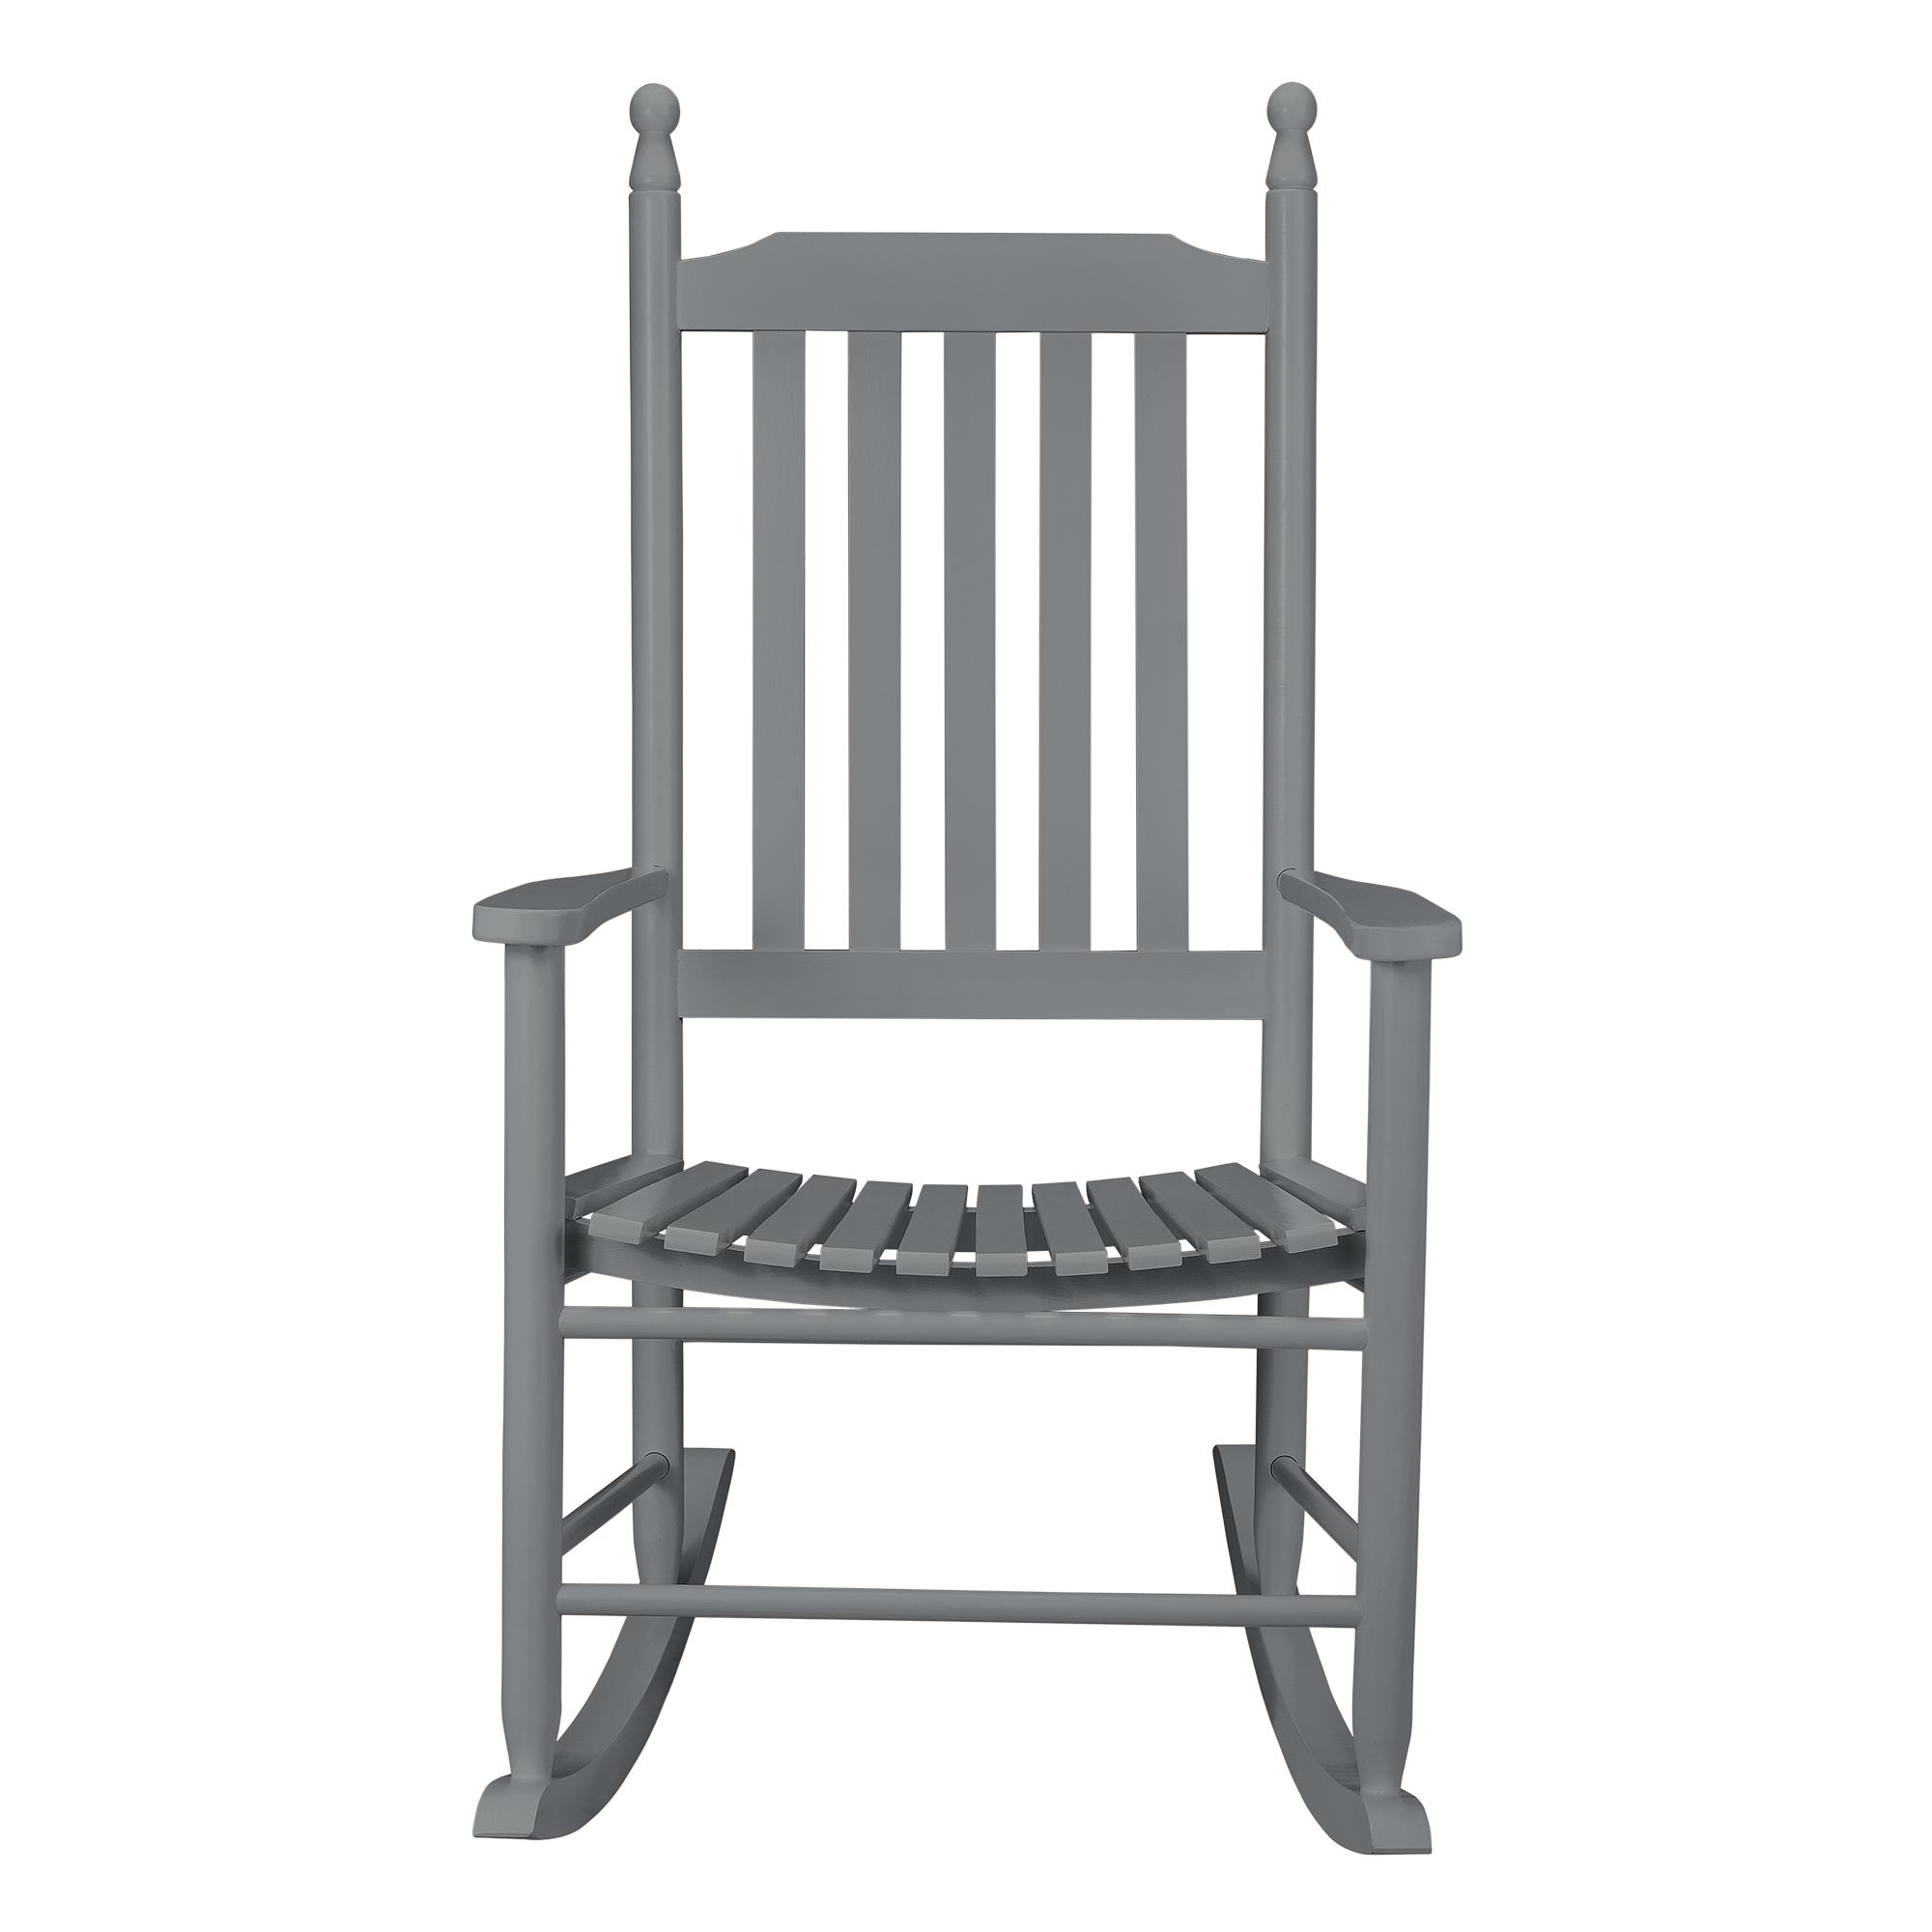 CasaproR Rocking Chair Texas Gris Siege Chaise A Bascule Balancoire